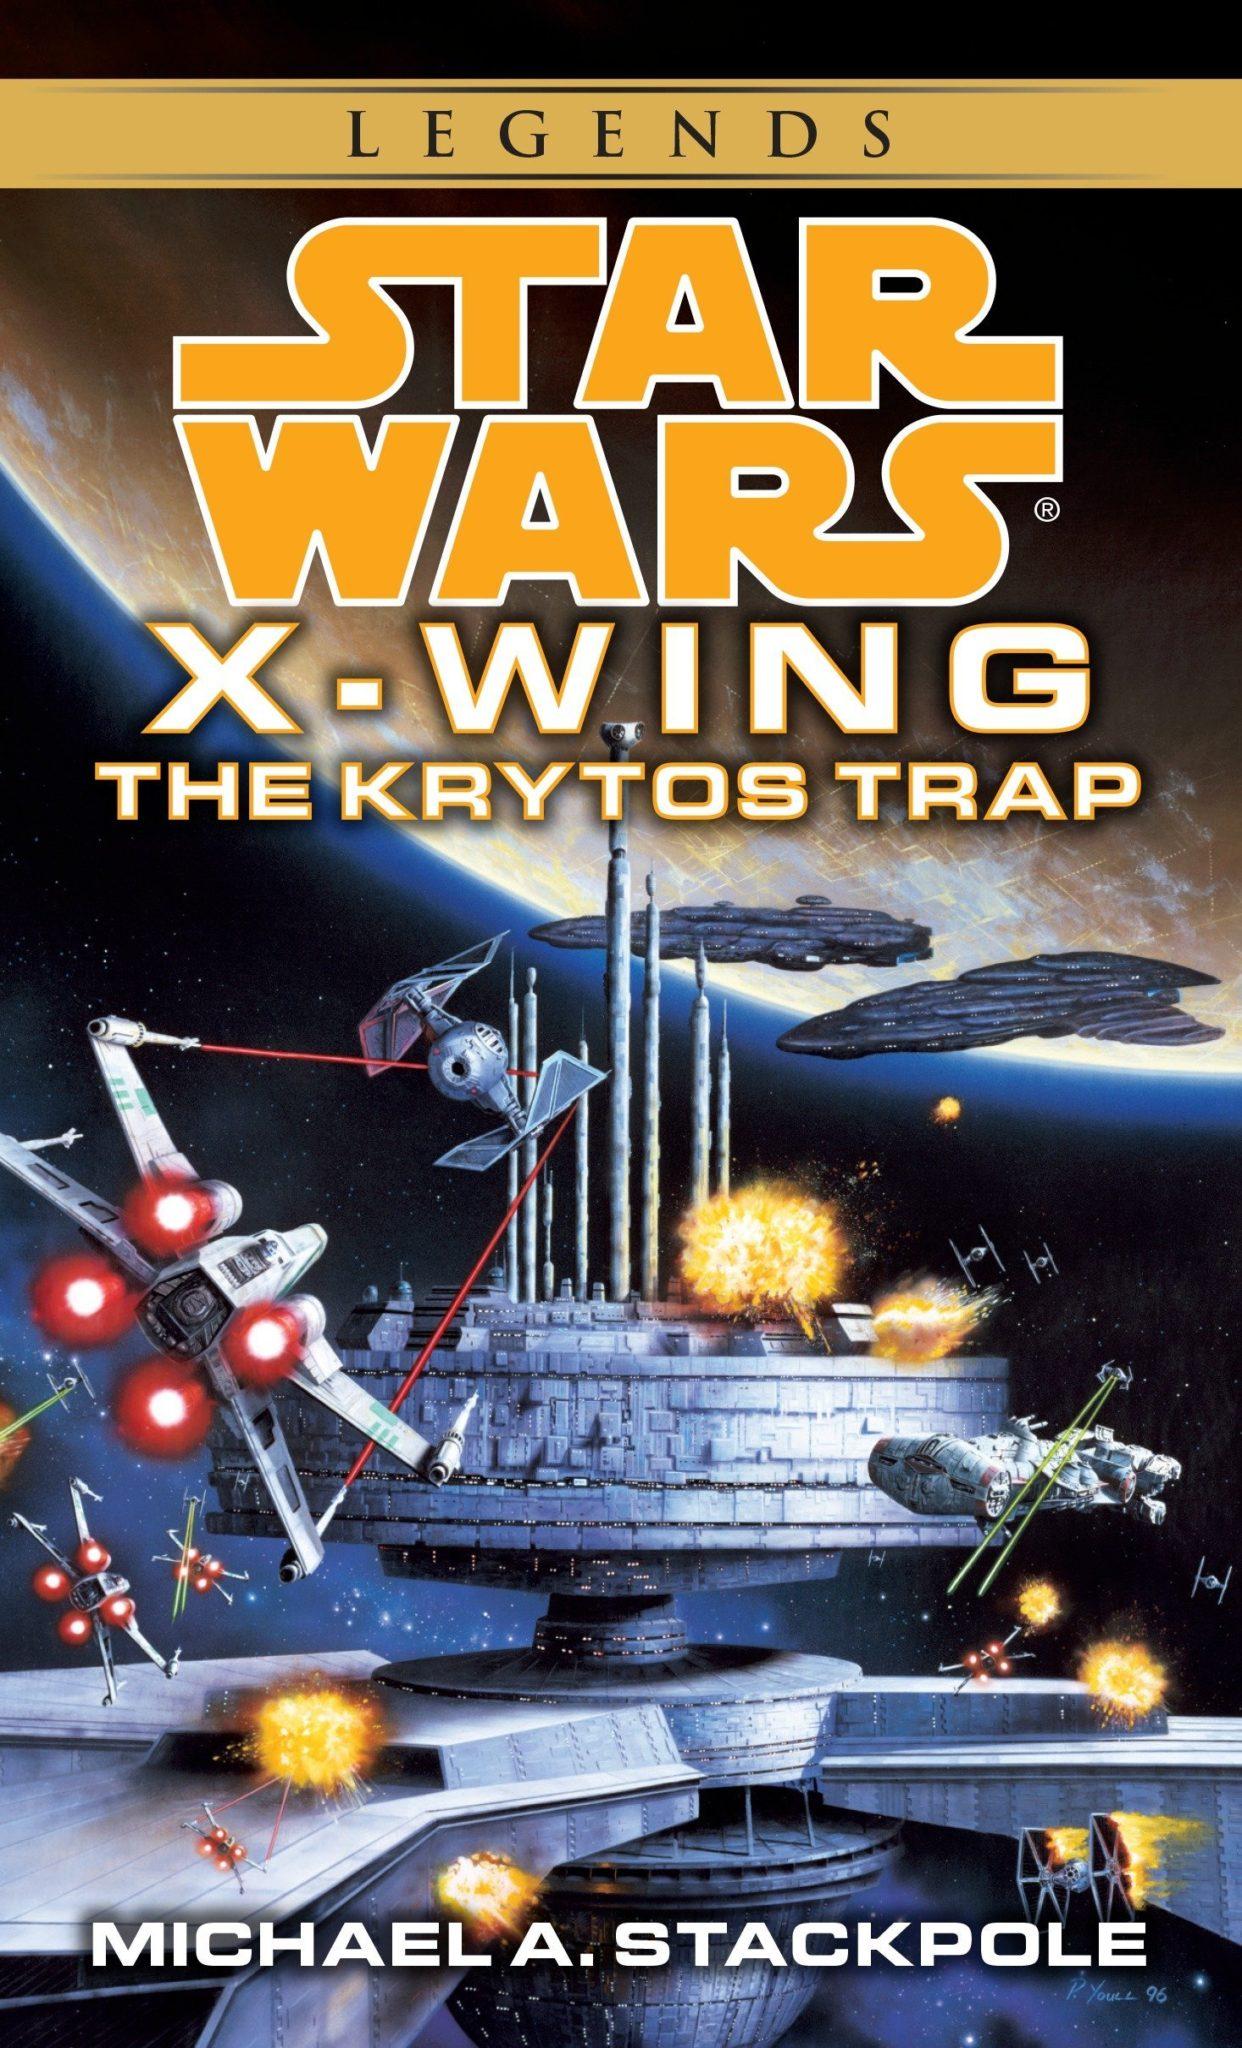 Star Wars books 11